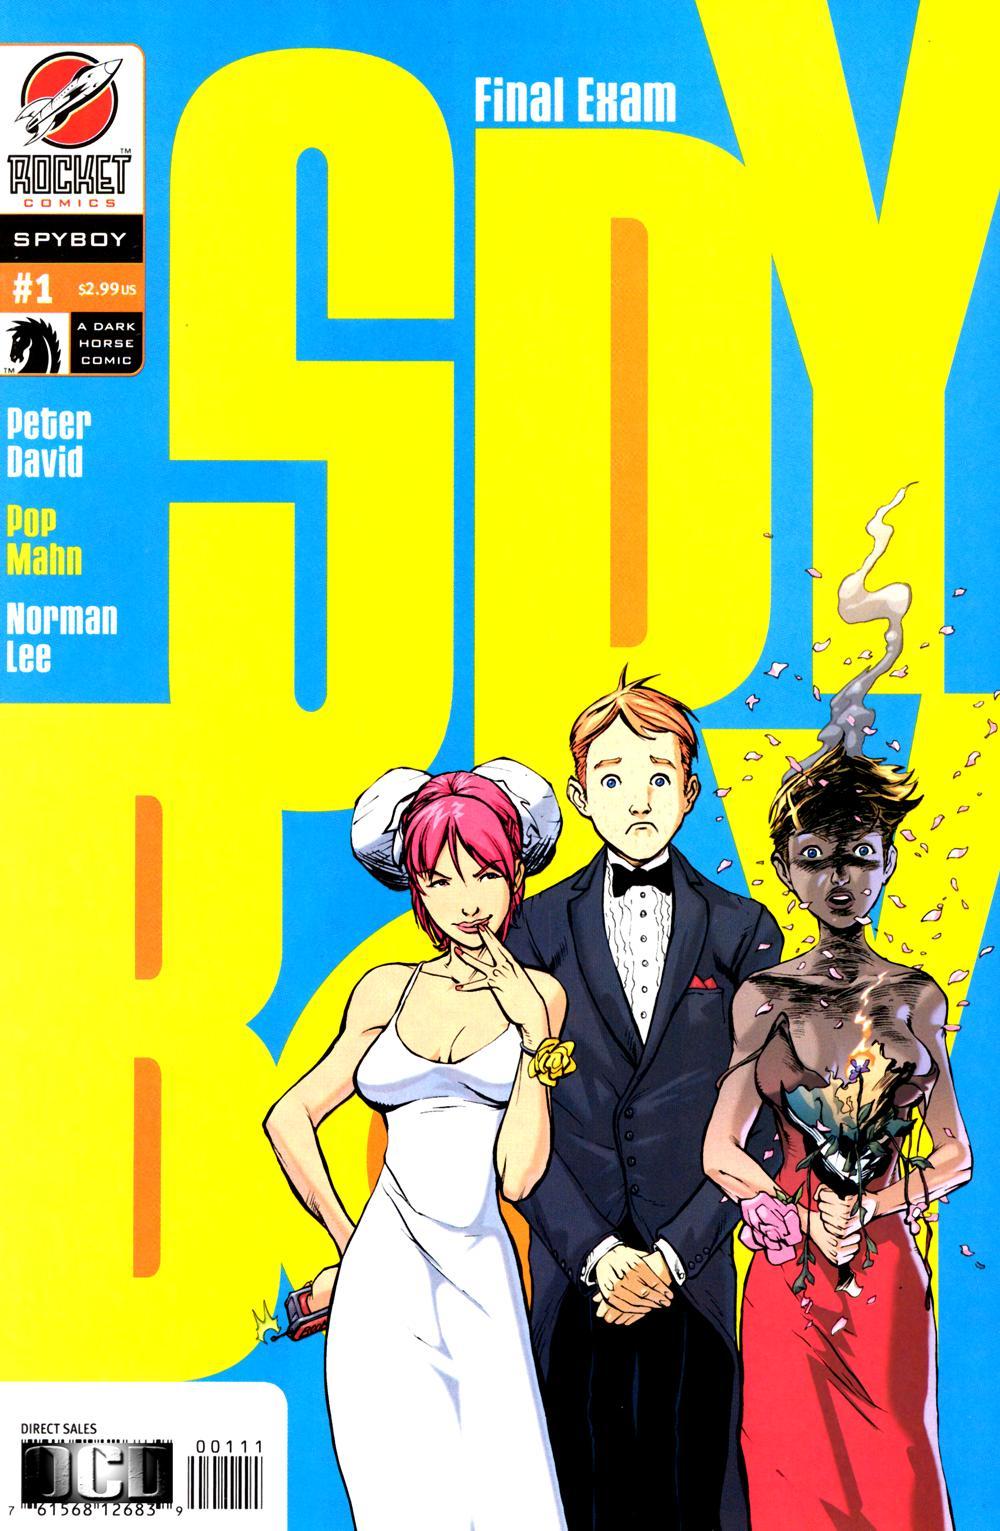 Read online SpyBoy: Final Exam comic -  Issue #1 - 1